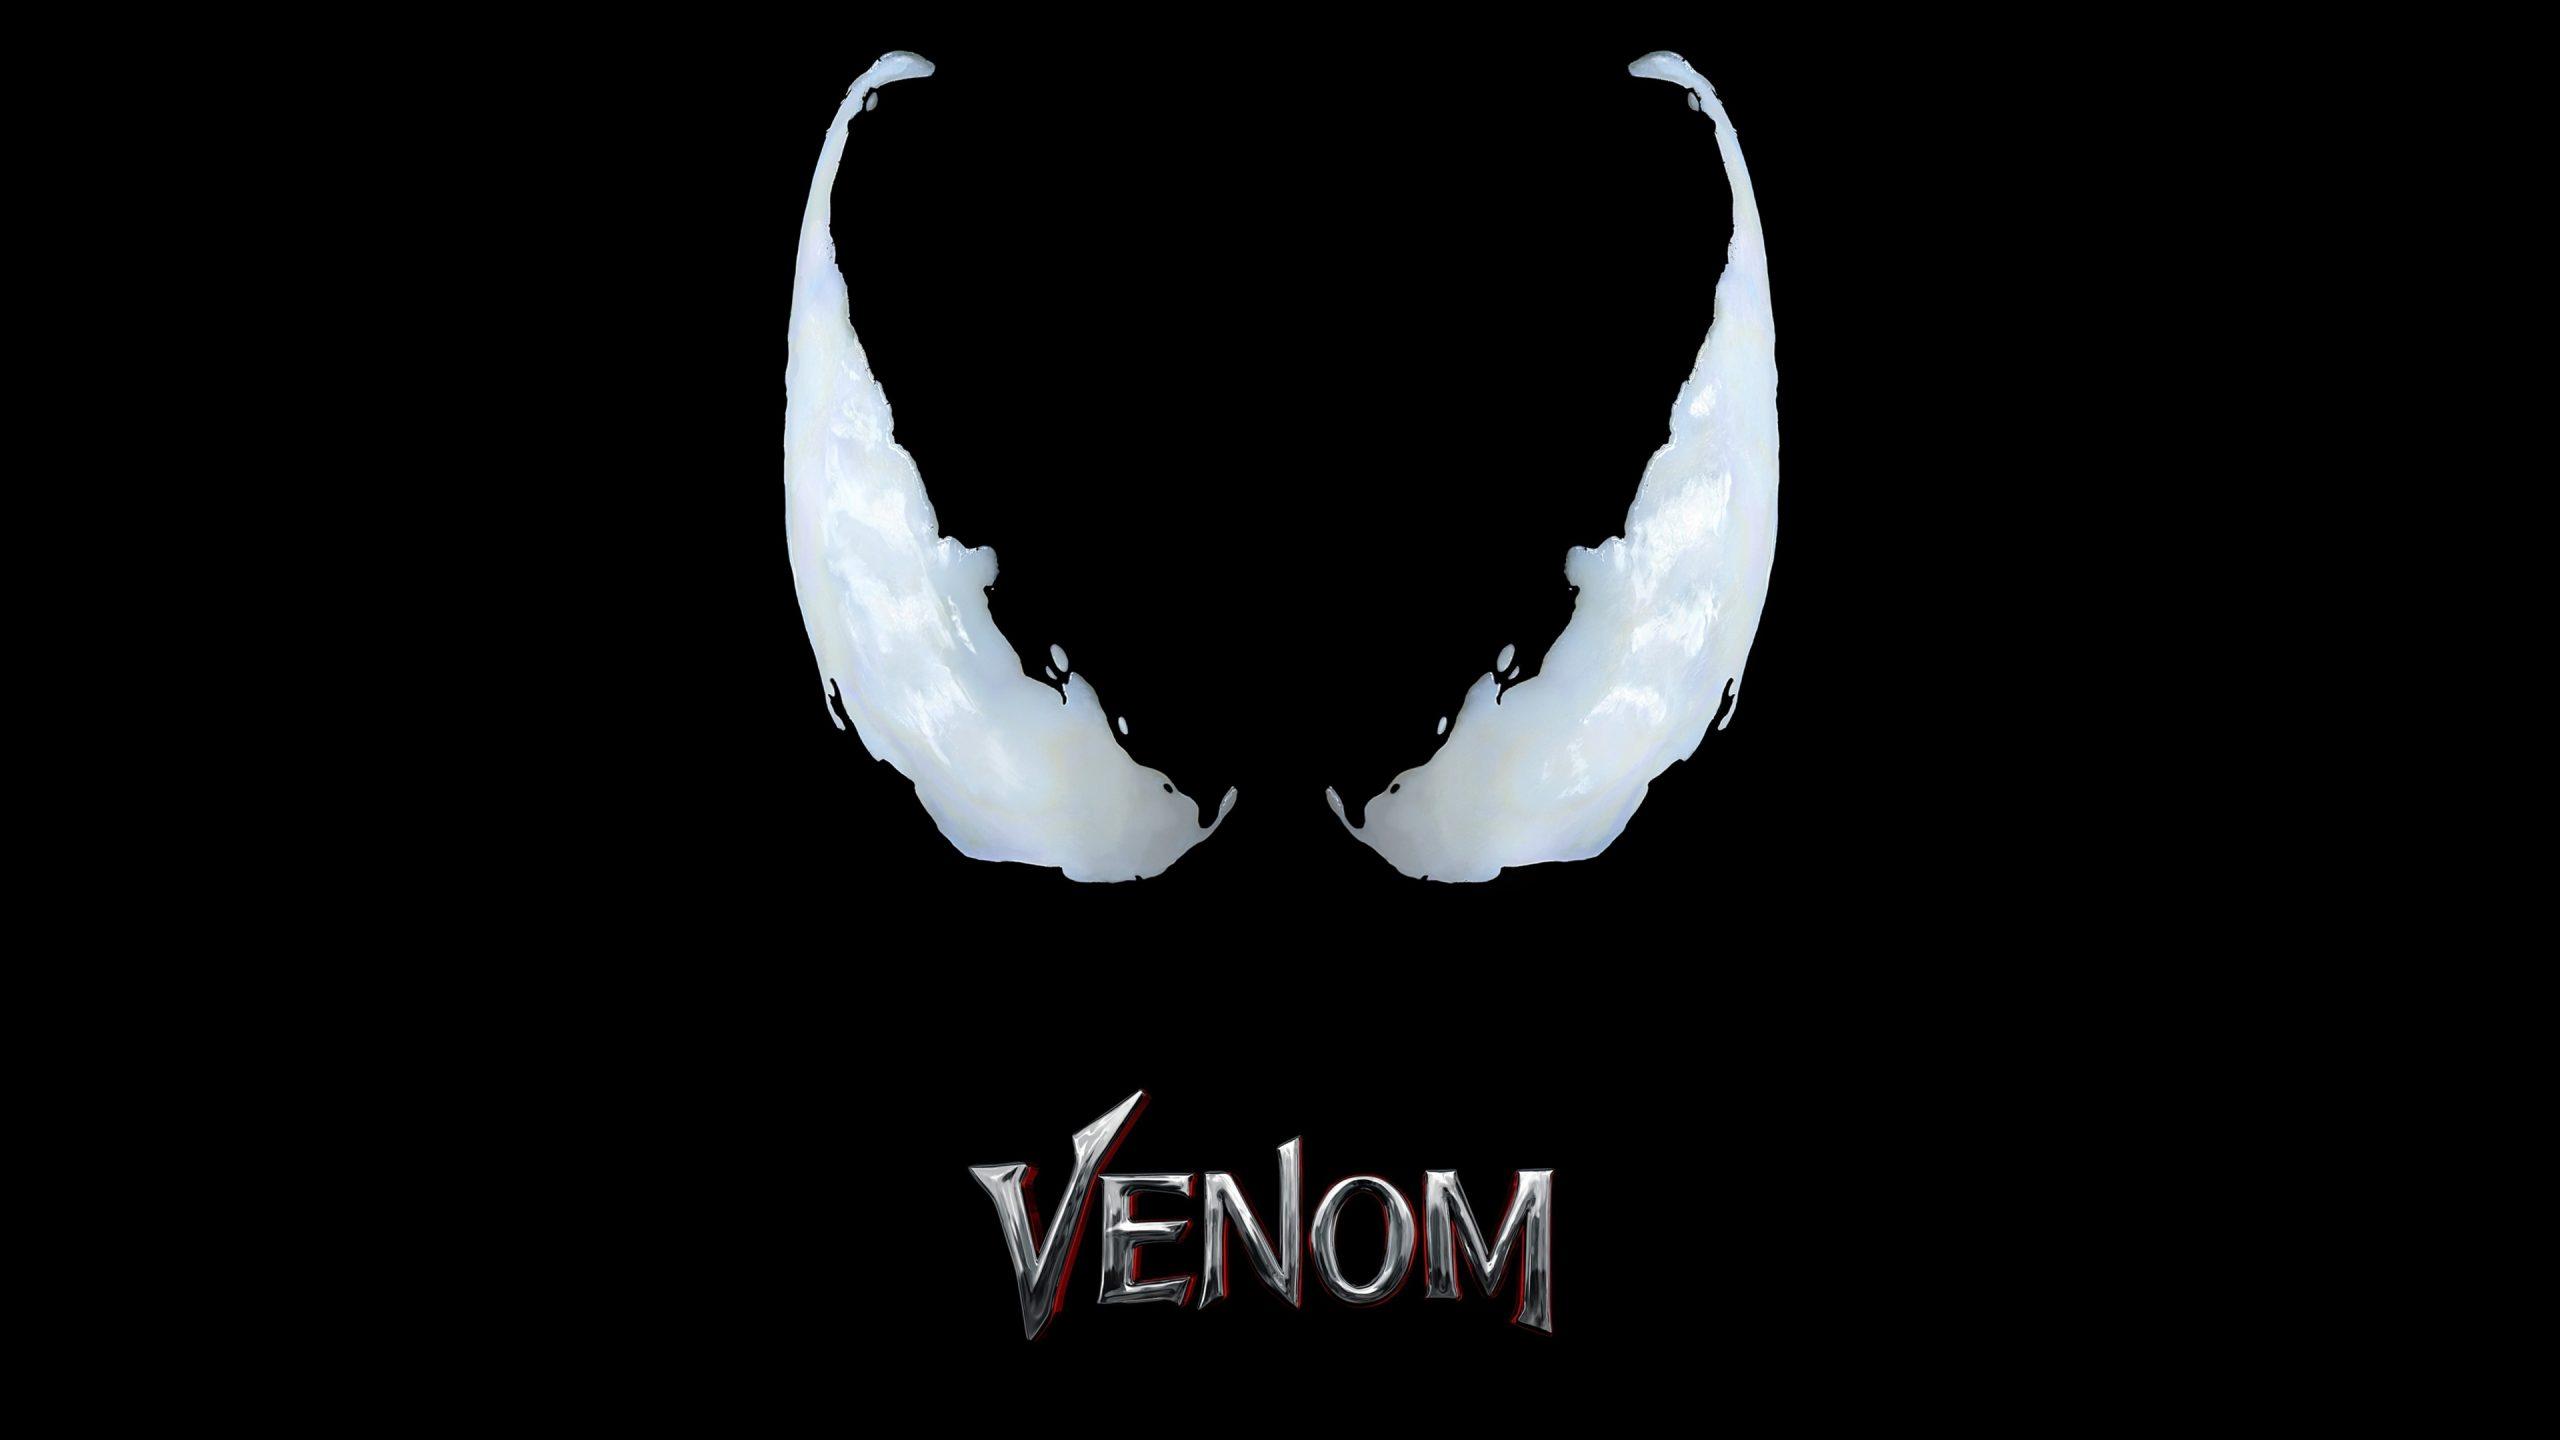 Venom Movie Logo Black 4k Wallpaper Best Wallpapers